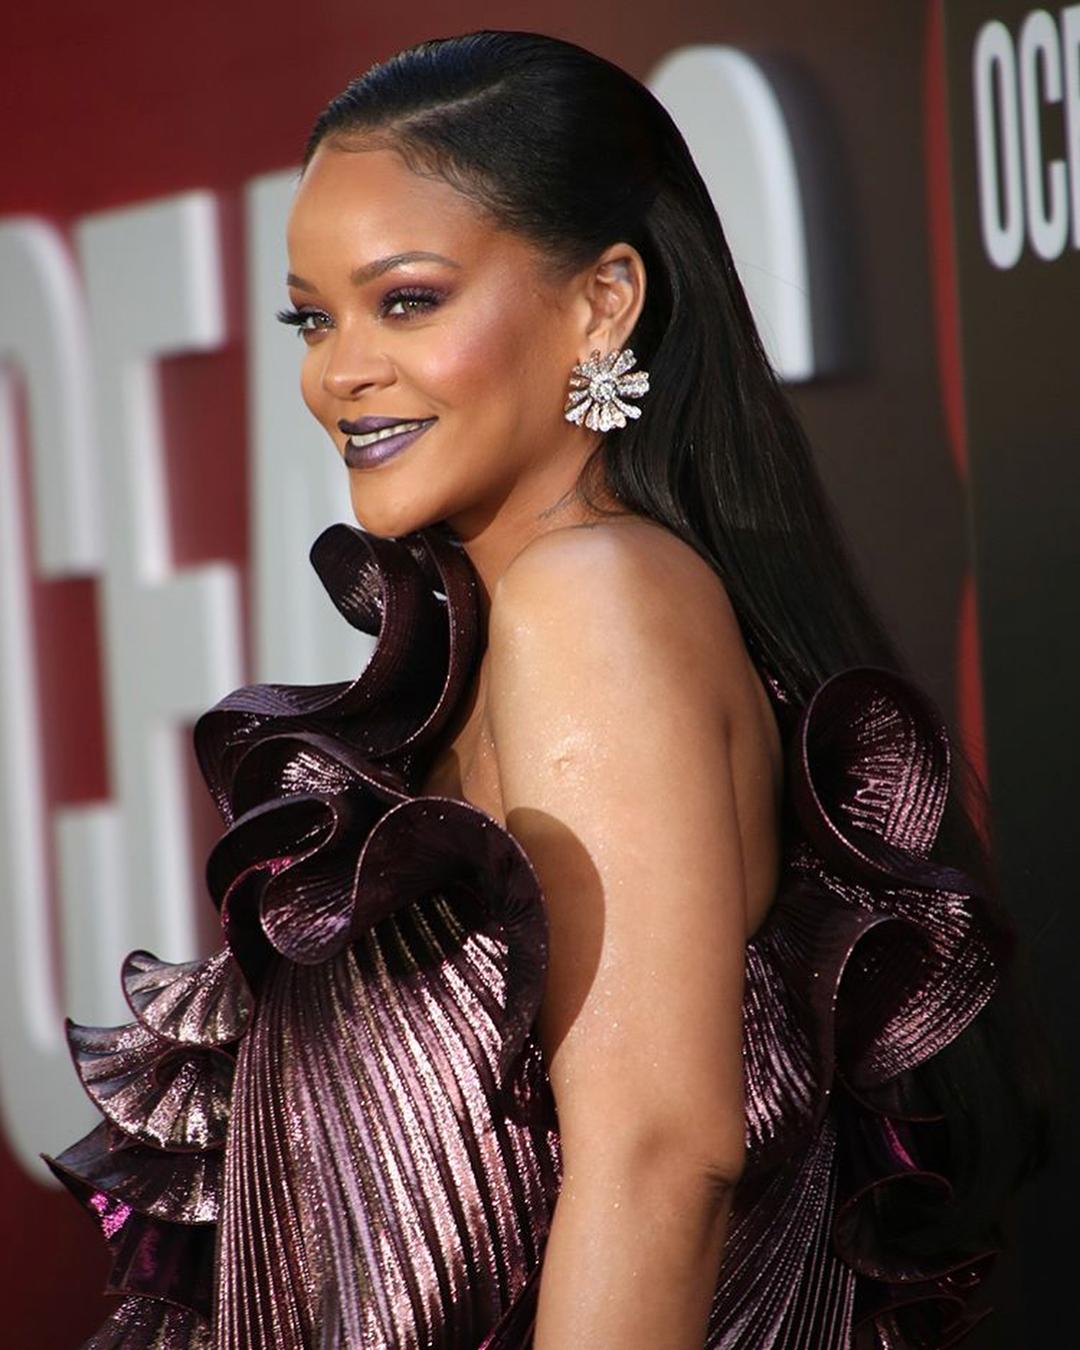 Rihanna becomes world richest female billionaire at 33